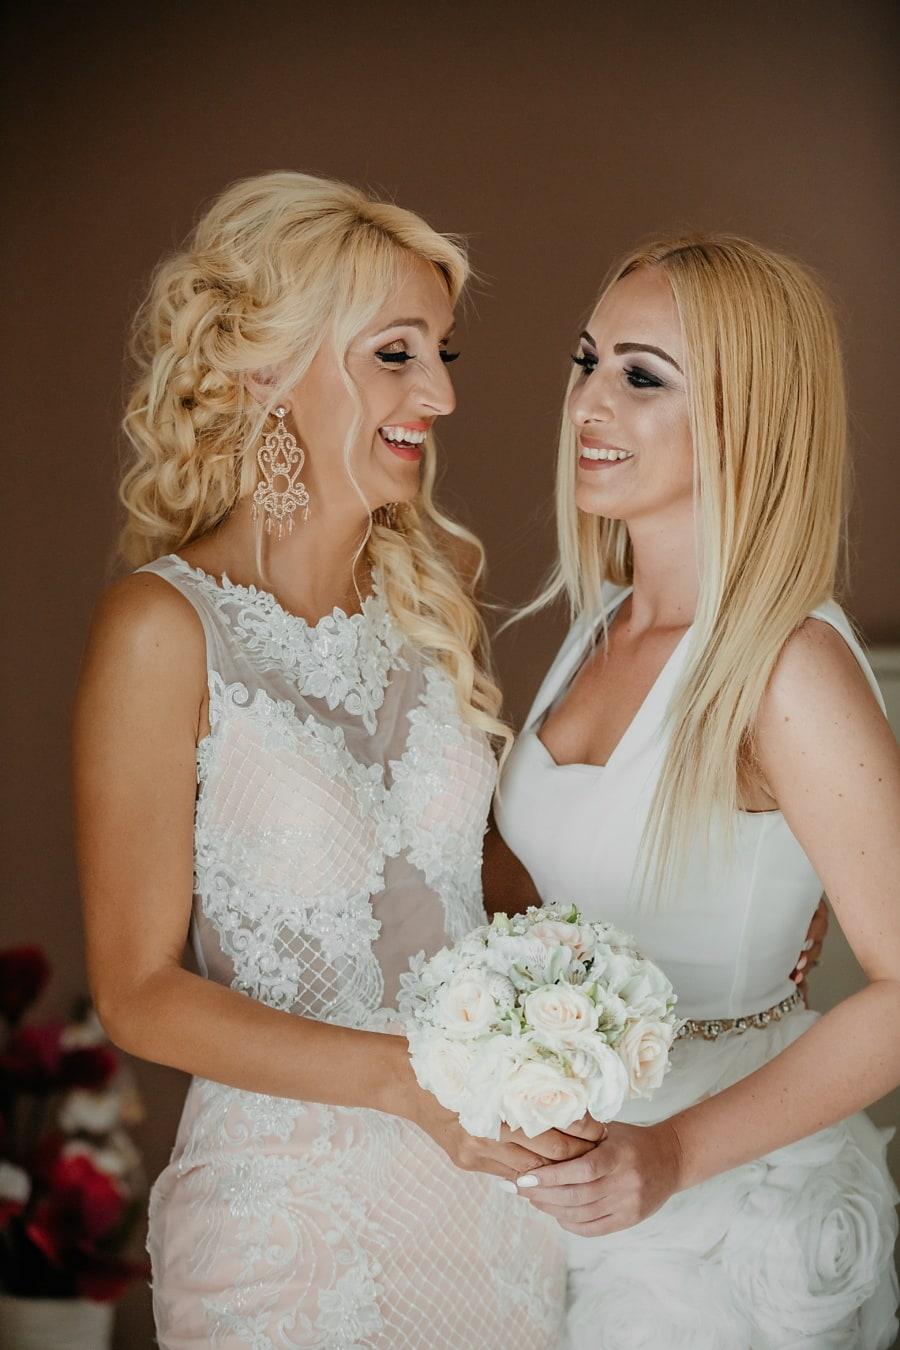 relationship, wedding, women, girlfriend, fashion, bouquet, dress, bride, woman, love